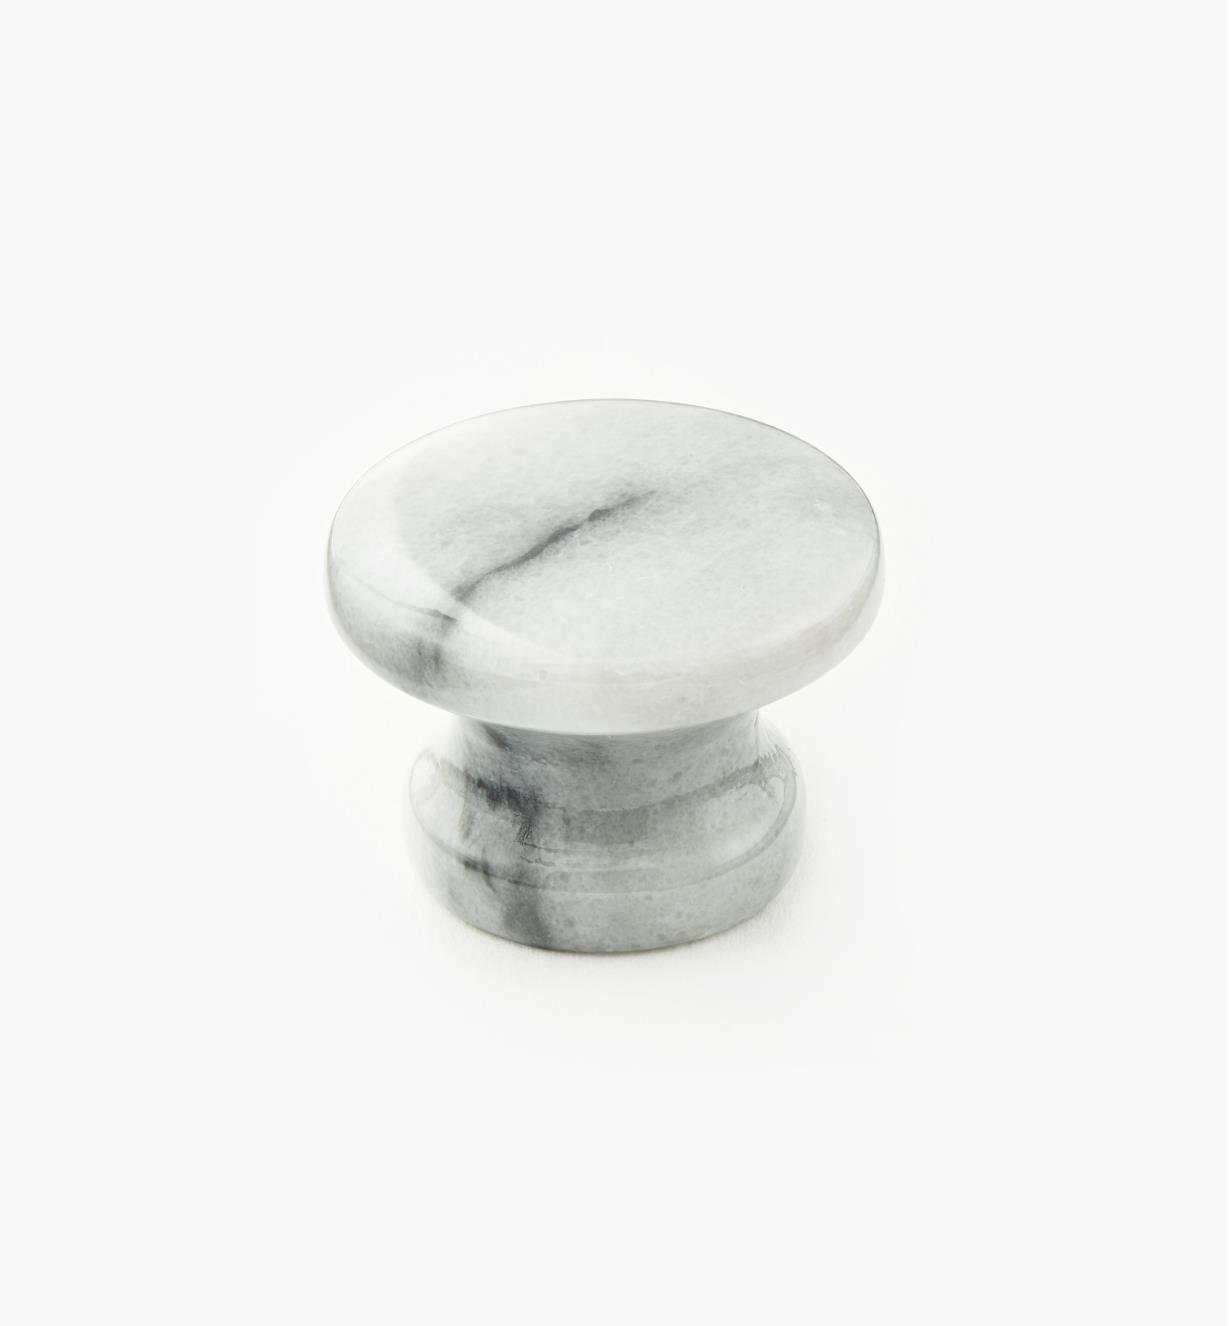 00W4024 - Bouton en marbre, blanc, 34 mm x 25 mm